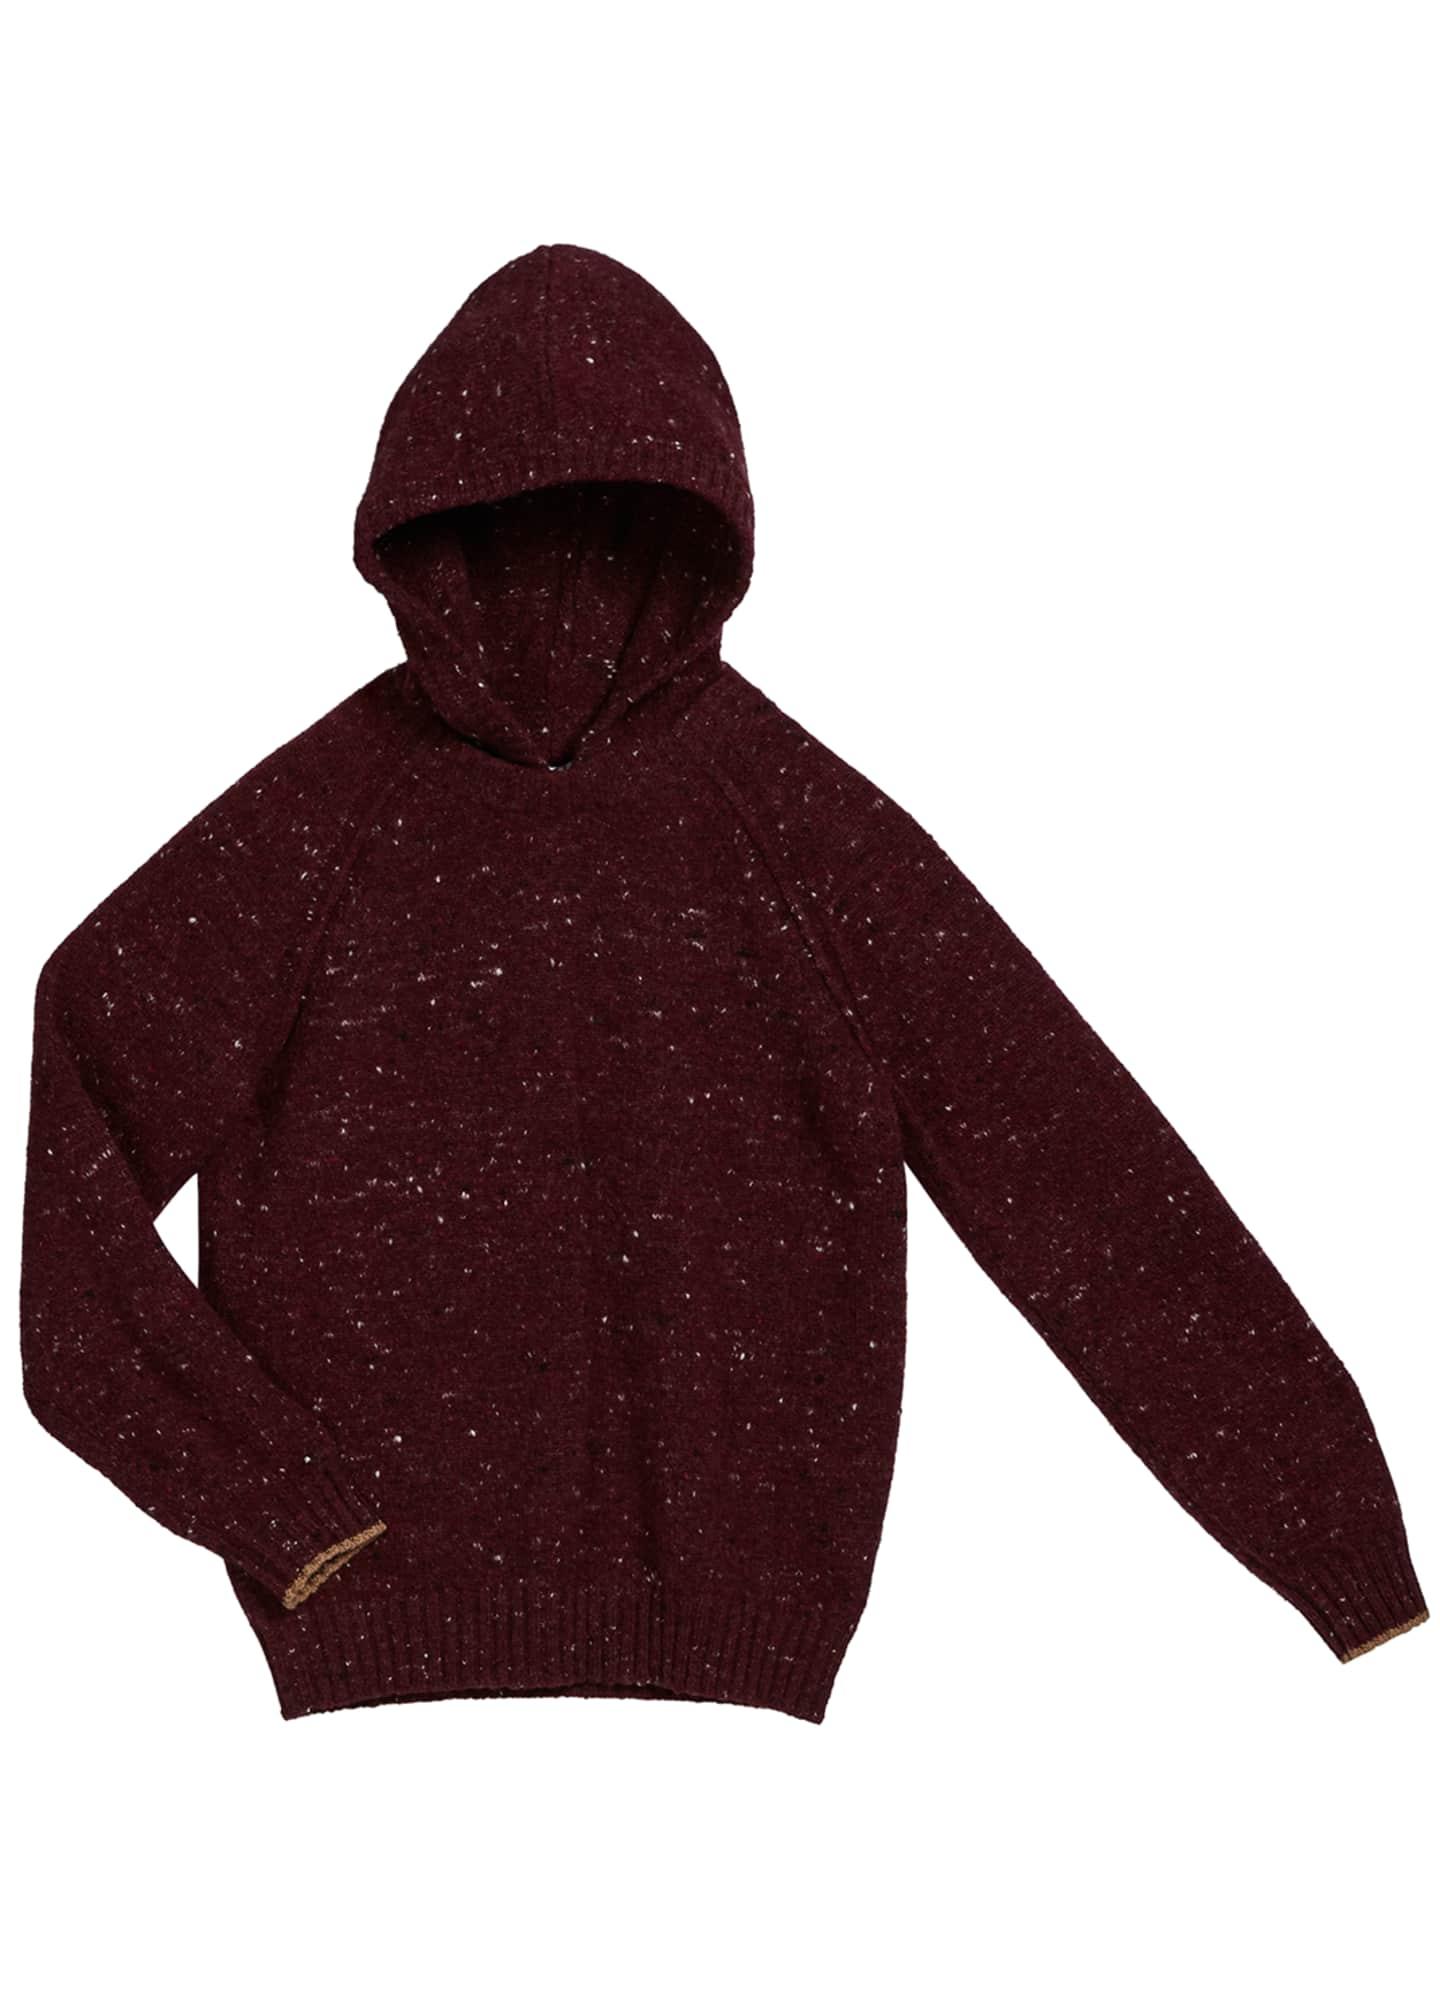 Brunello Cucinelli Boy's Speckled Tweed Hooded Sweater, Size